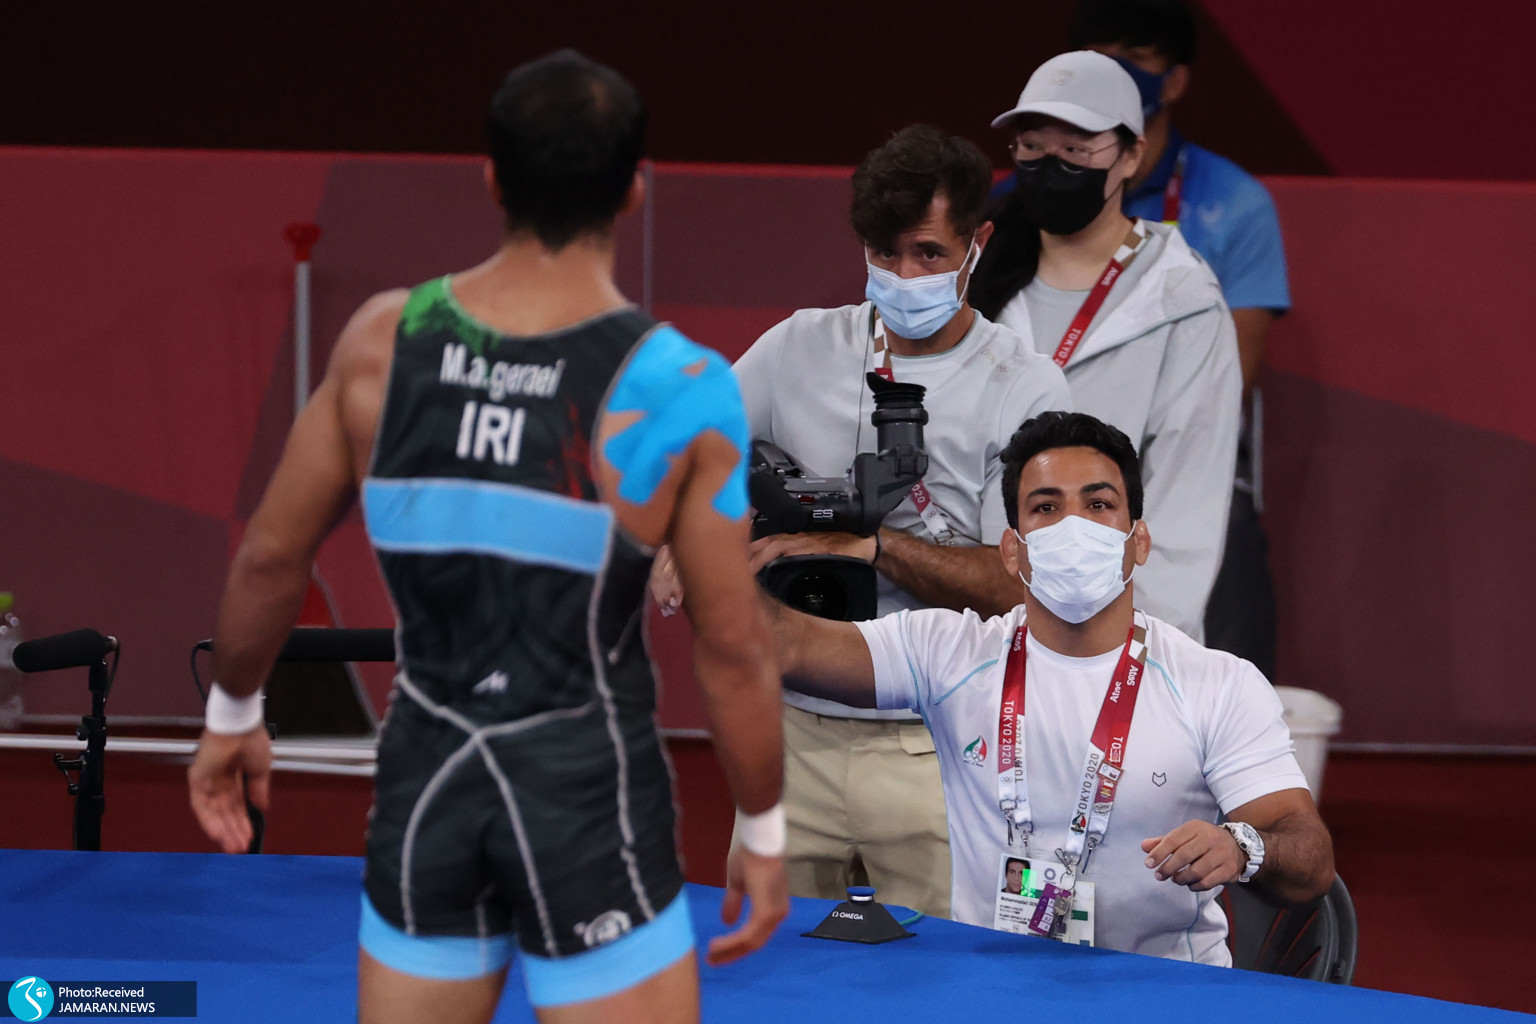 حبیب الله اخلاقی محمدعلی گرایی کشتی فرنگی المپیک